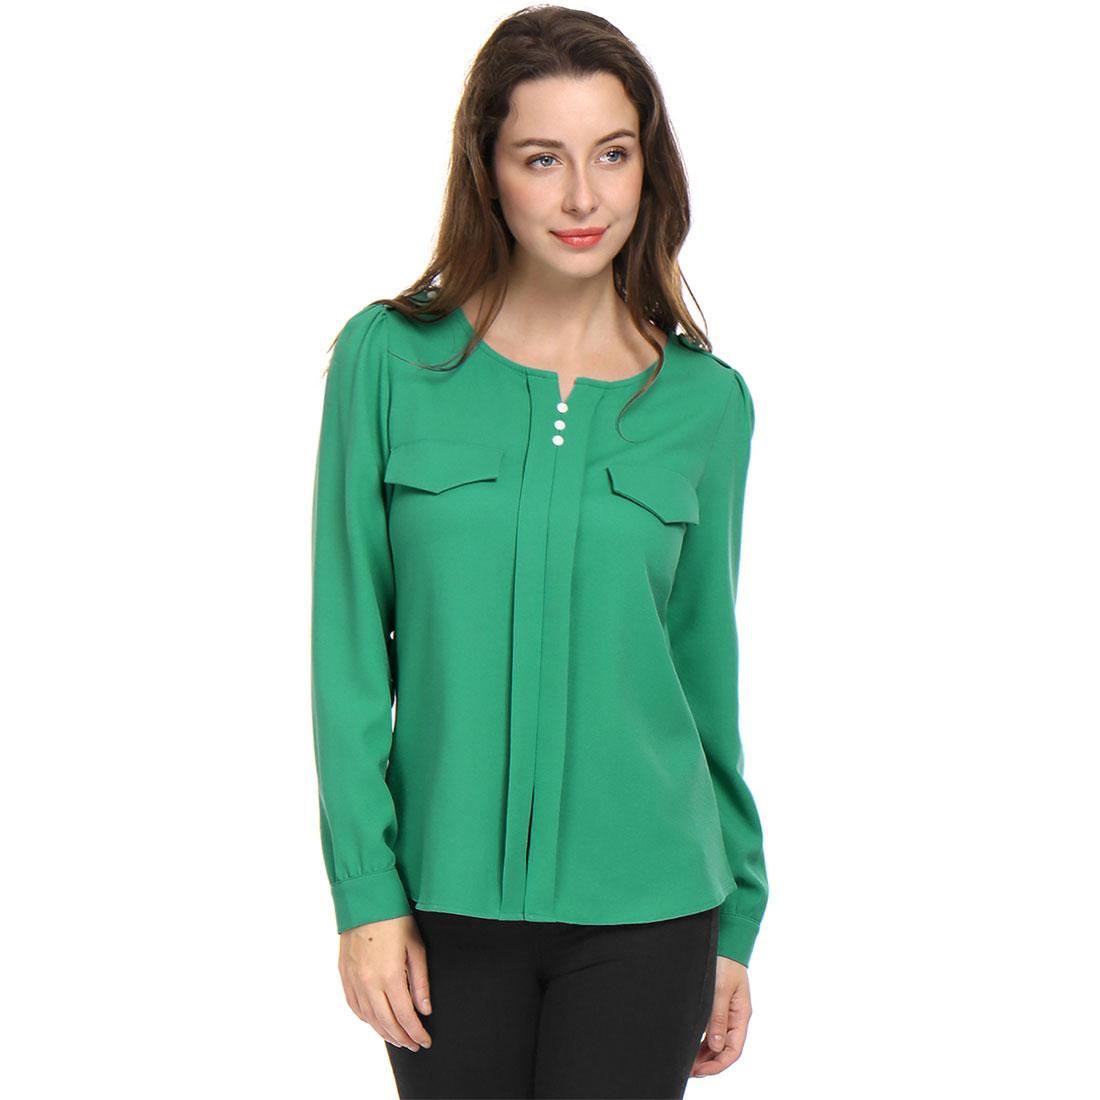 Allegra K Women Buttons Decor Mock Pockets Ruched Blouse